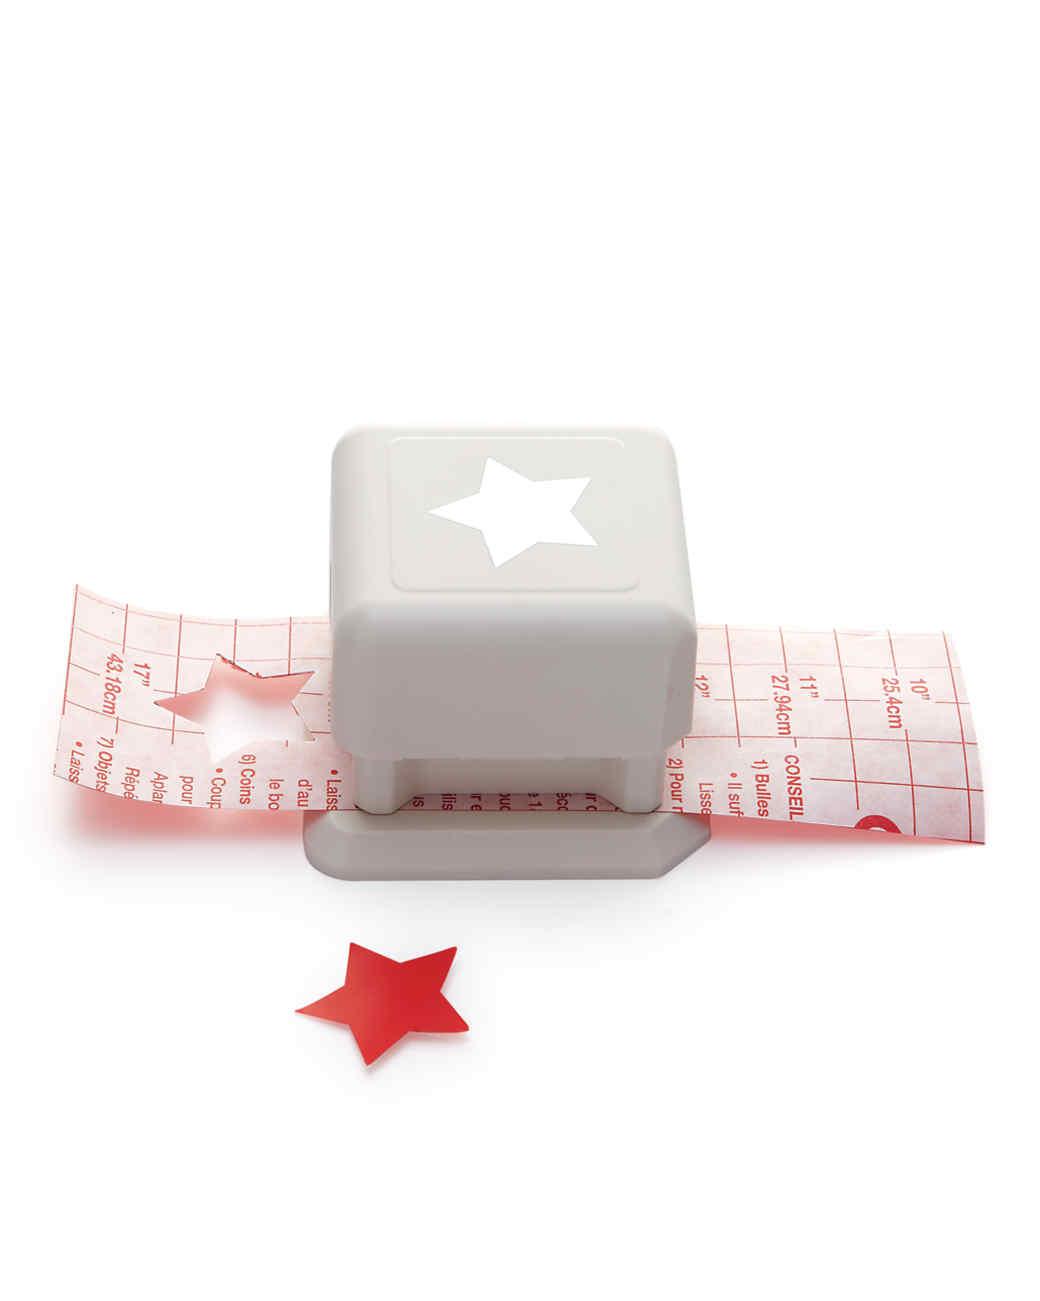 stamp-001-mld109144.jpg